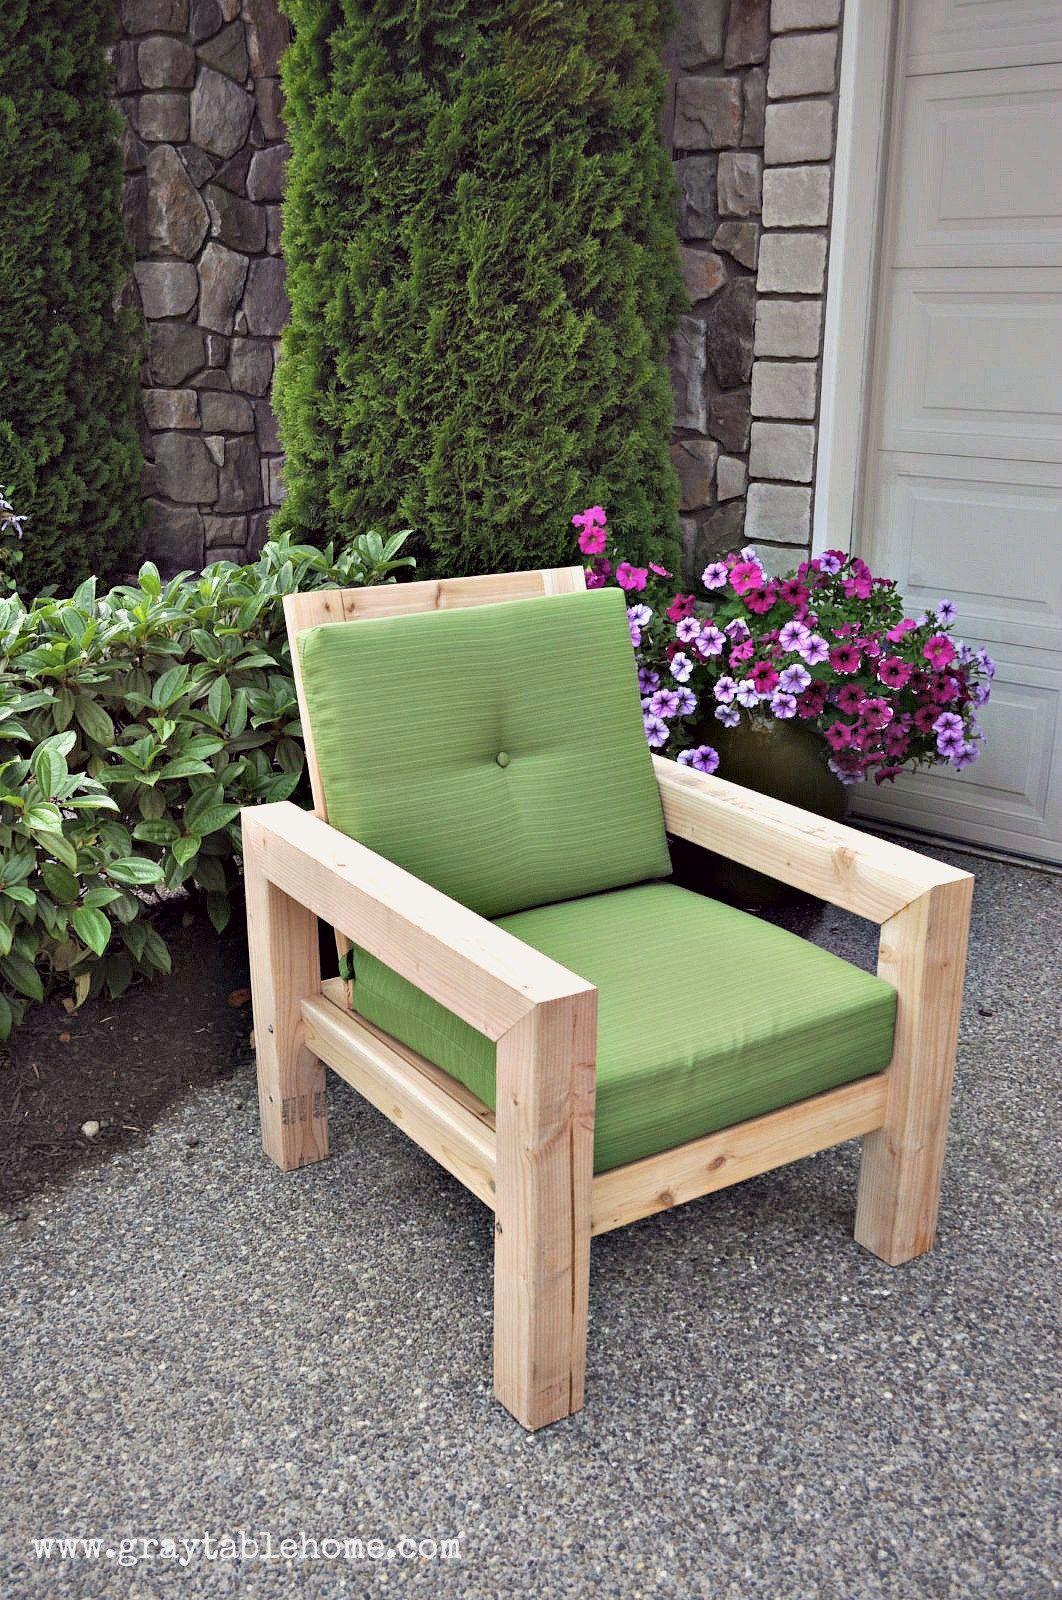 Diy Patio Chair Cushion Covers Car Walmart Modern Rustic Outdoor Plans Using